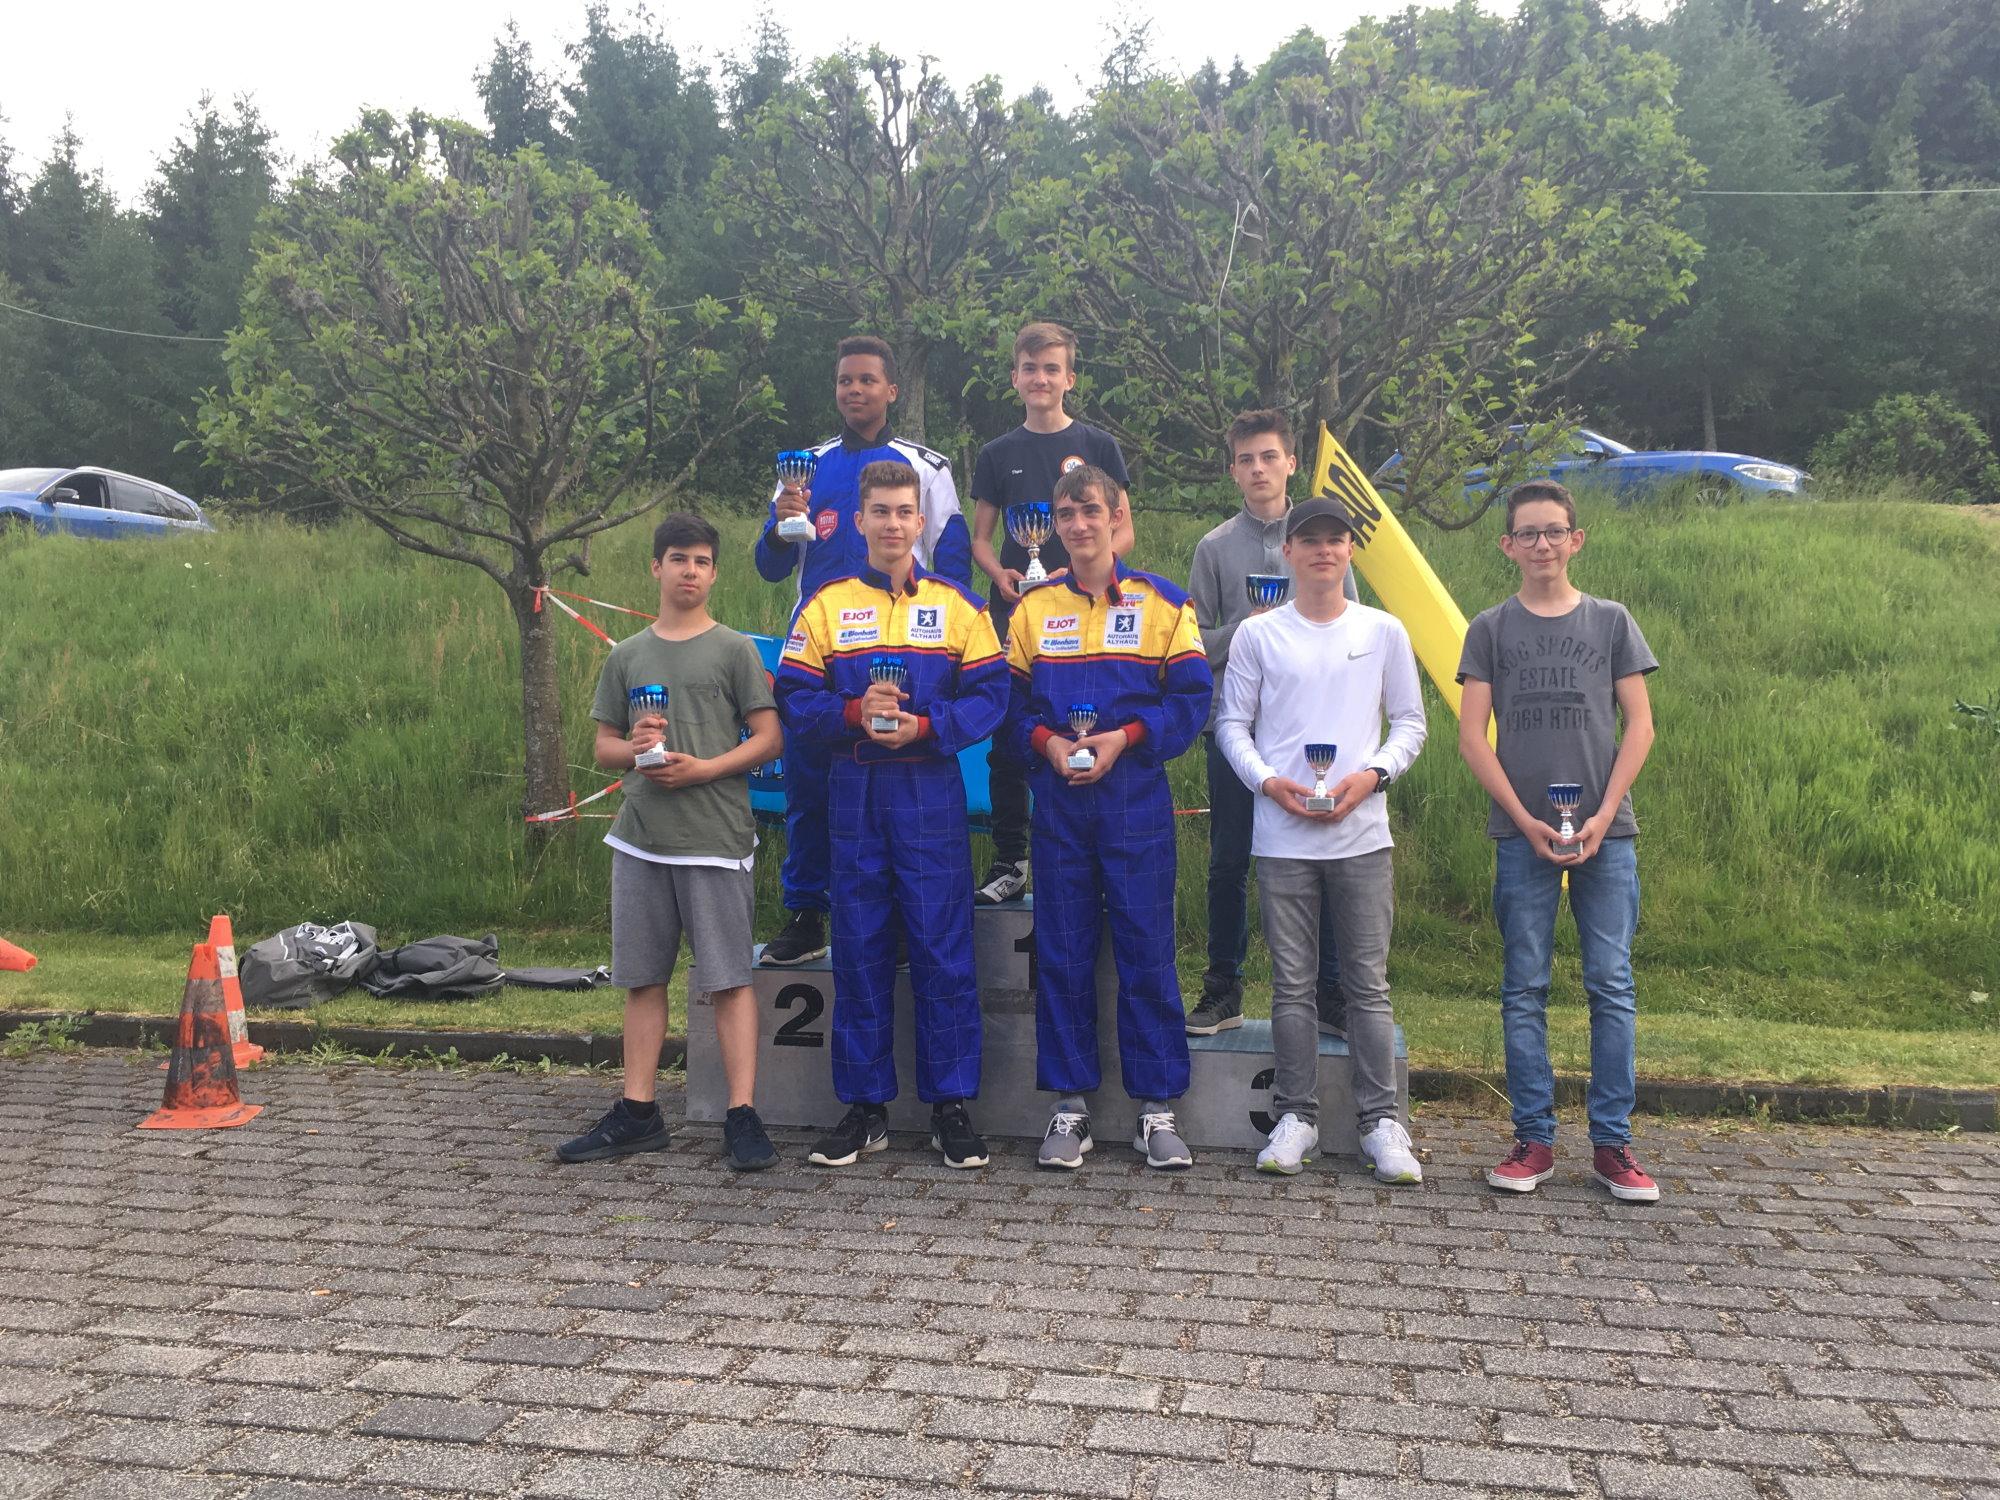 Siegerehrung ADAC Kartslalom Burbach-Oeventrop, K4-2 OAC